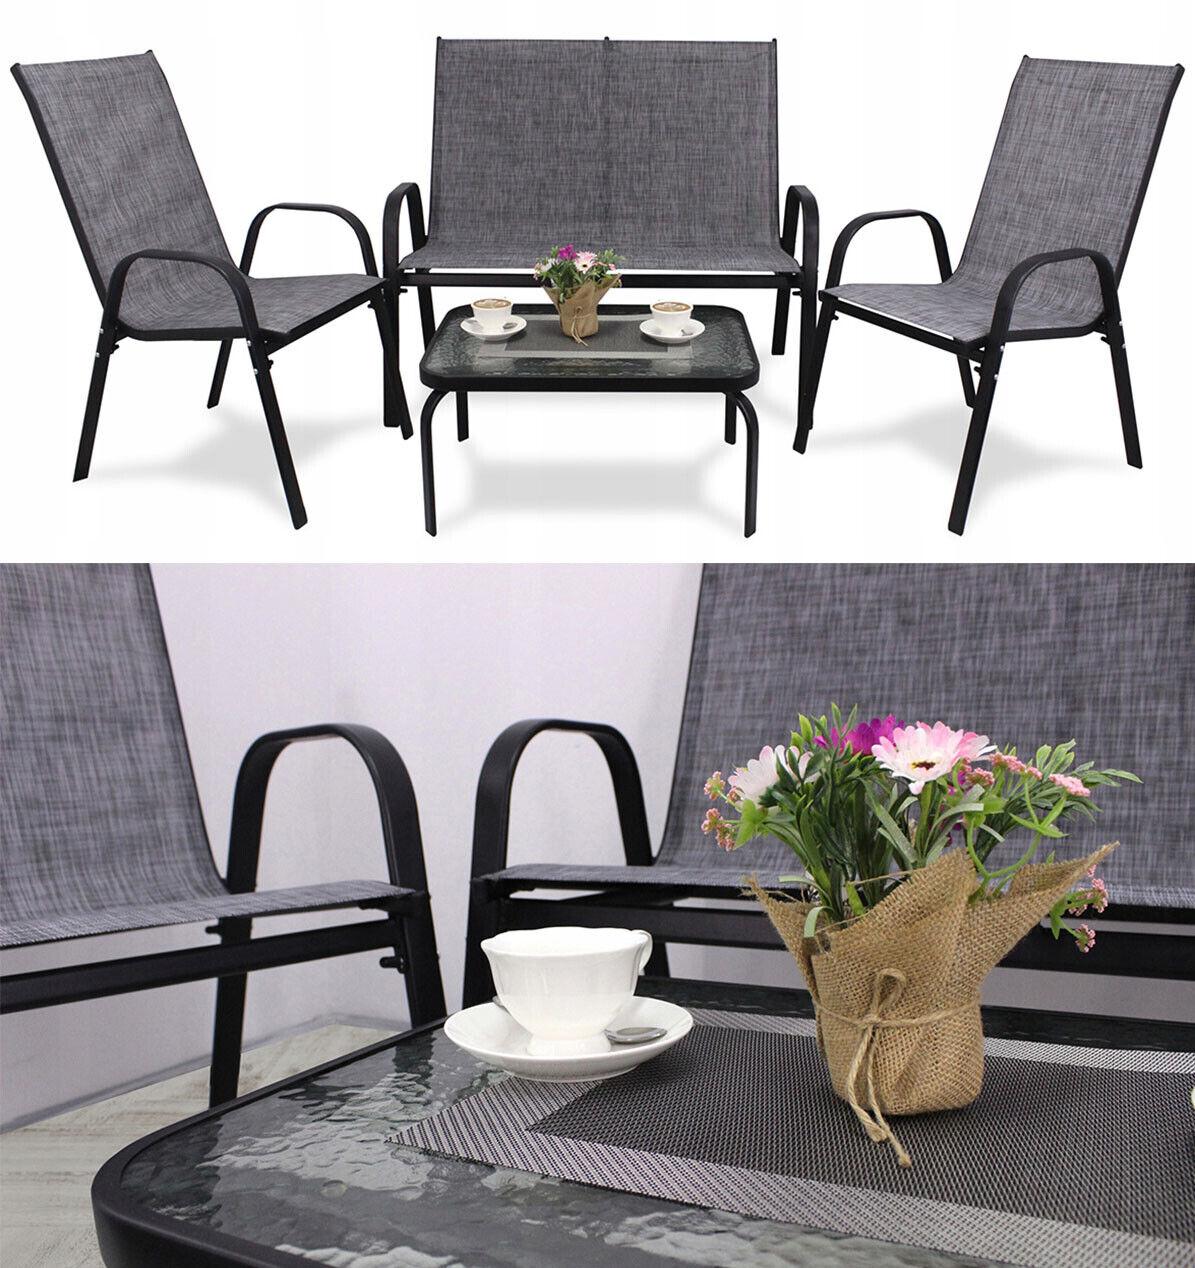 Garden Furniture - A set of garden furniture - sofa + table + chairs